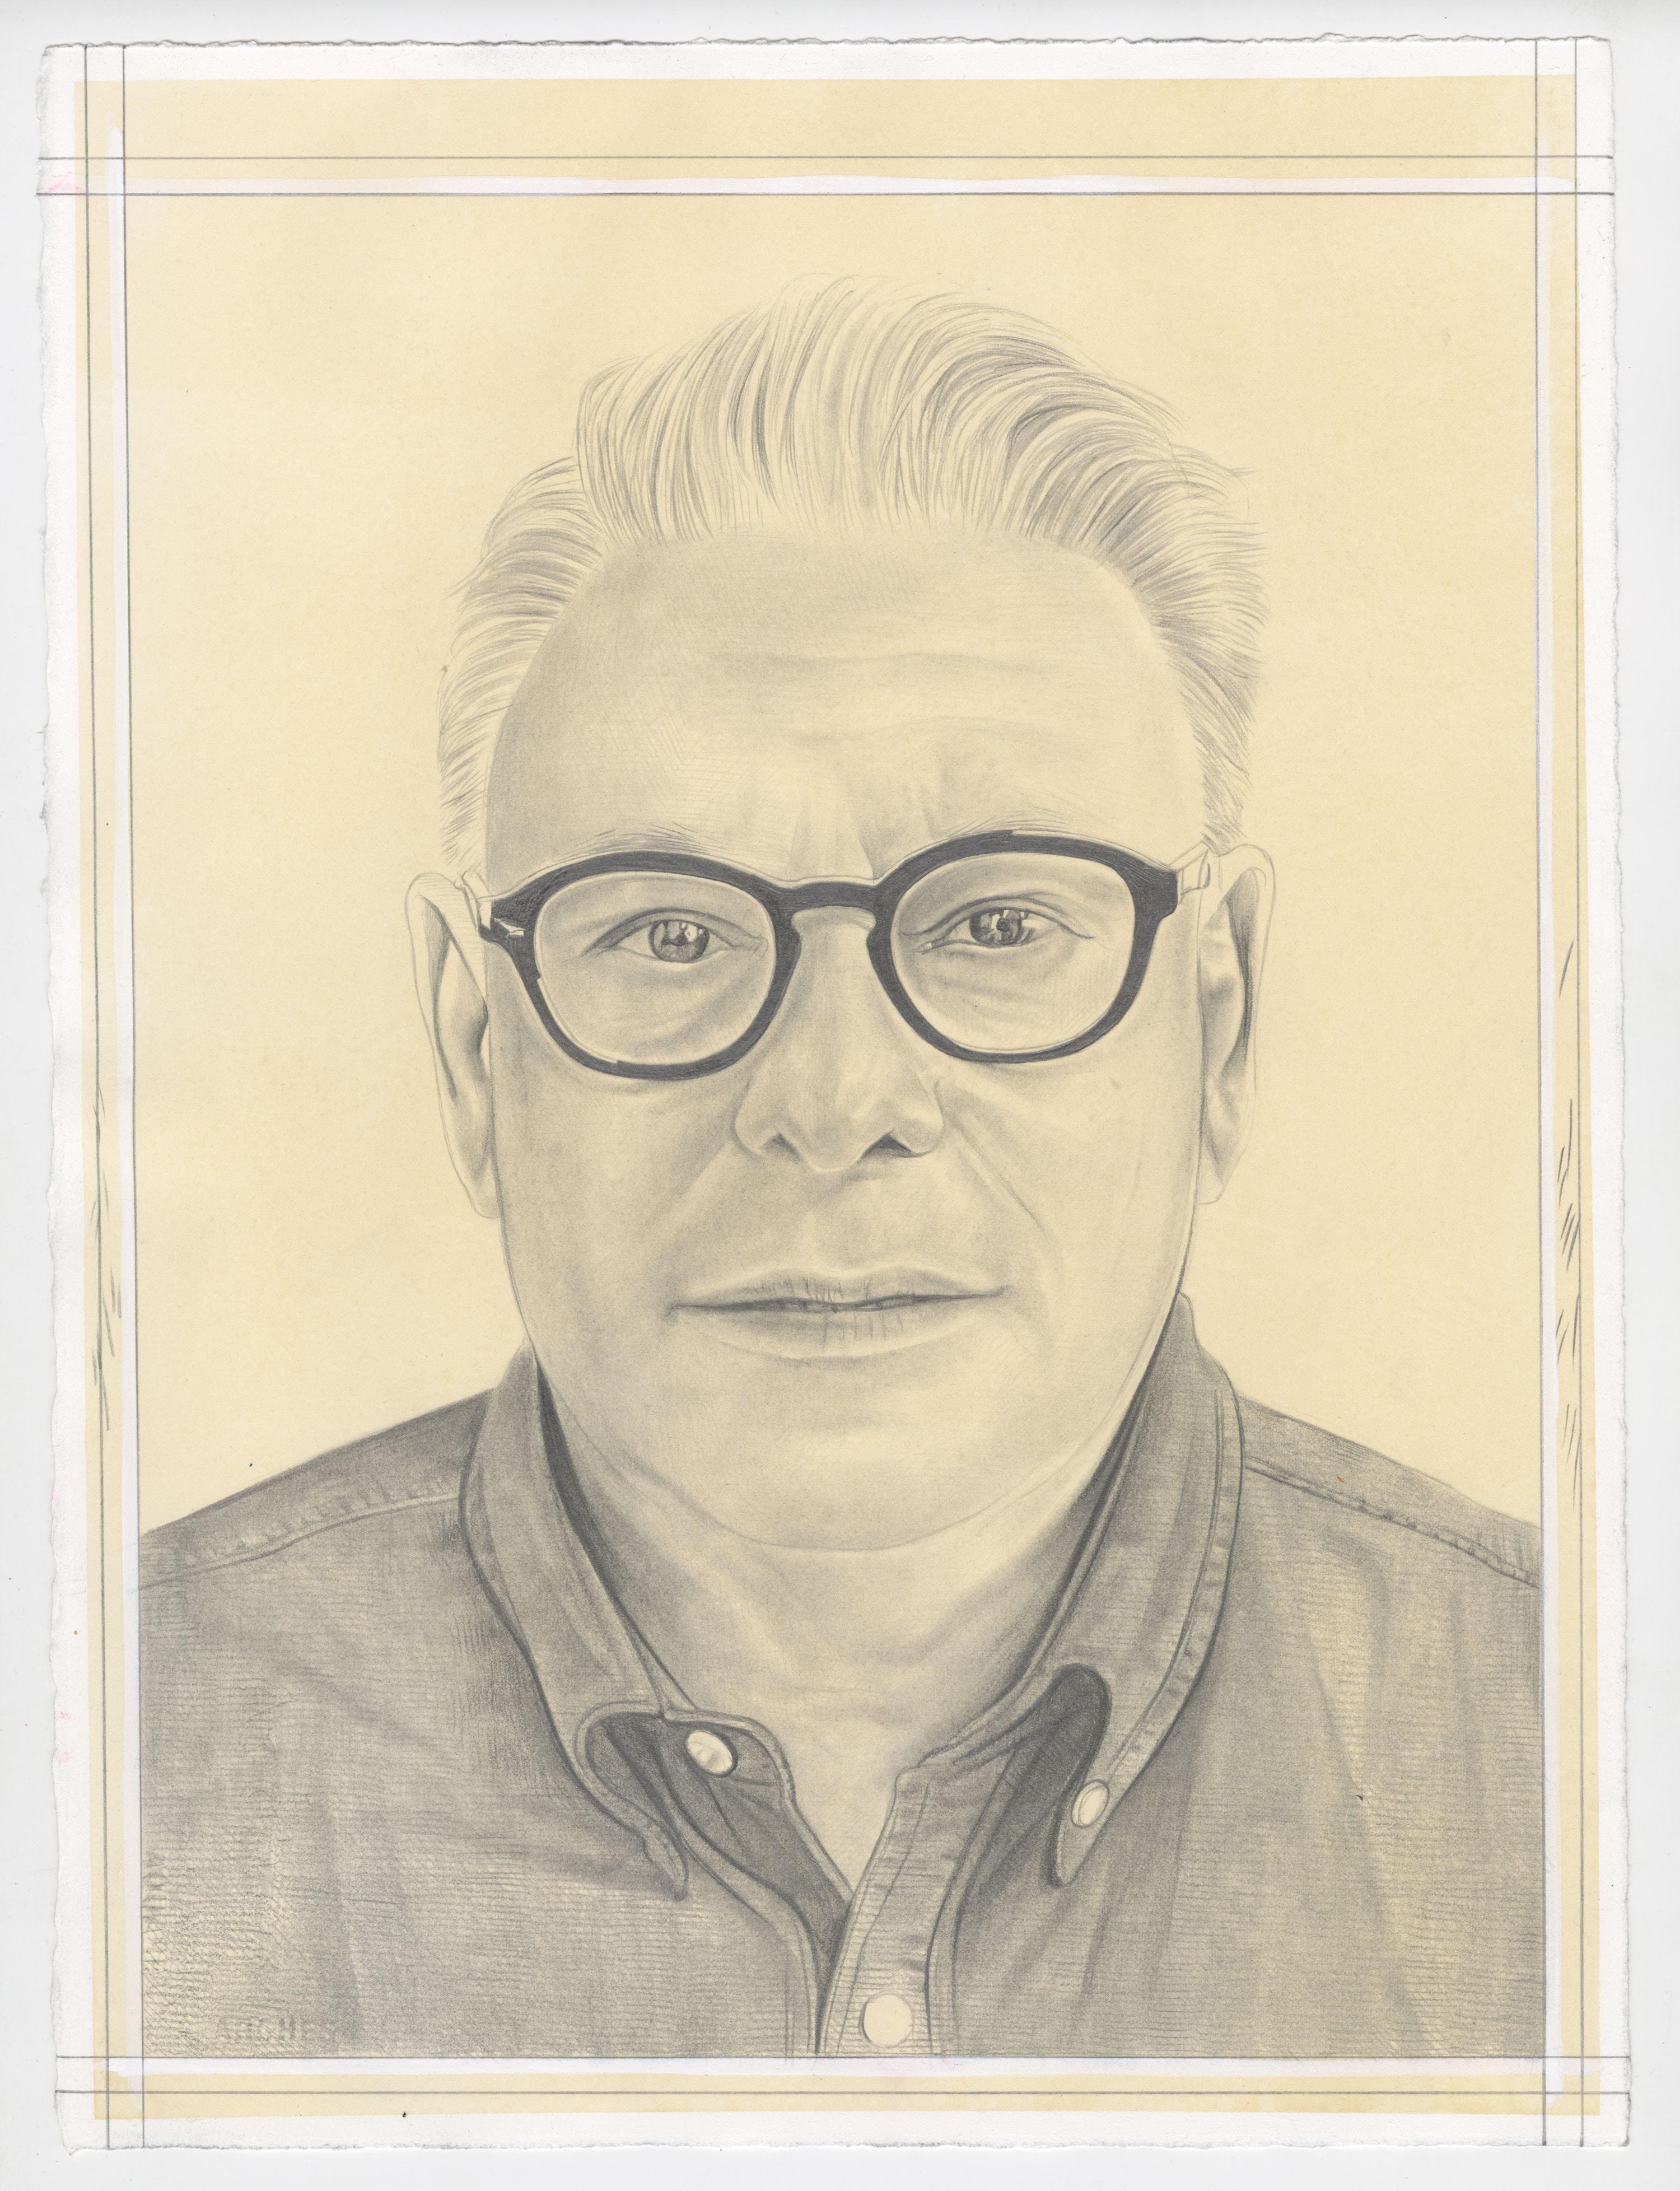 Portrait of Lari Pittman, pencil on paper by Phong Bui.